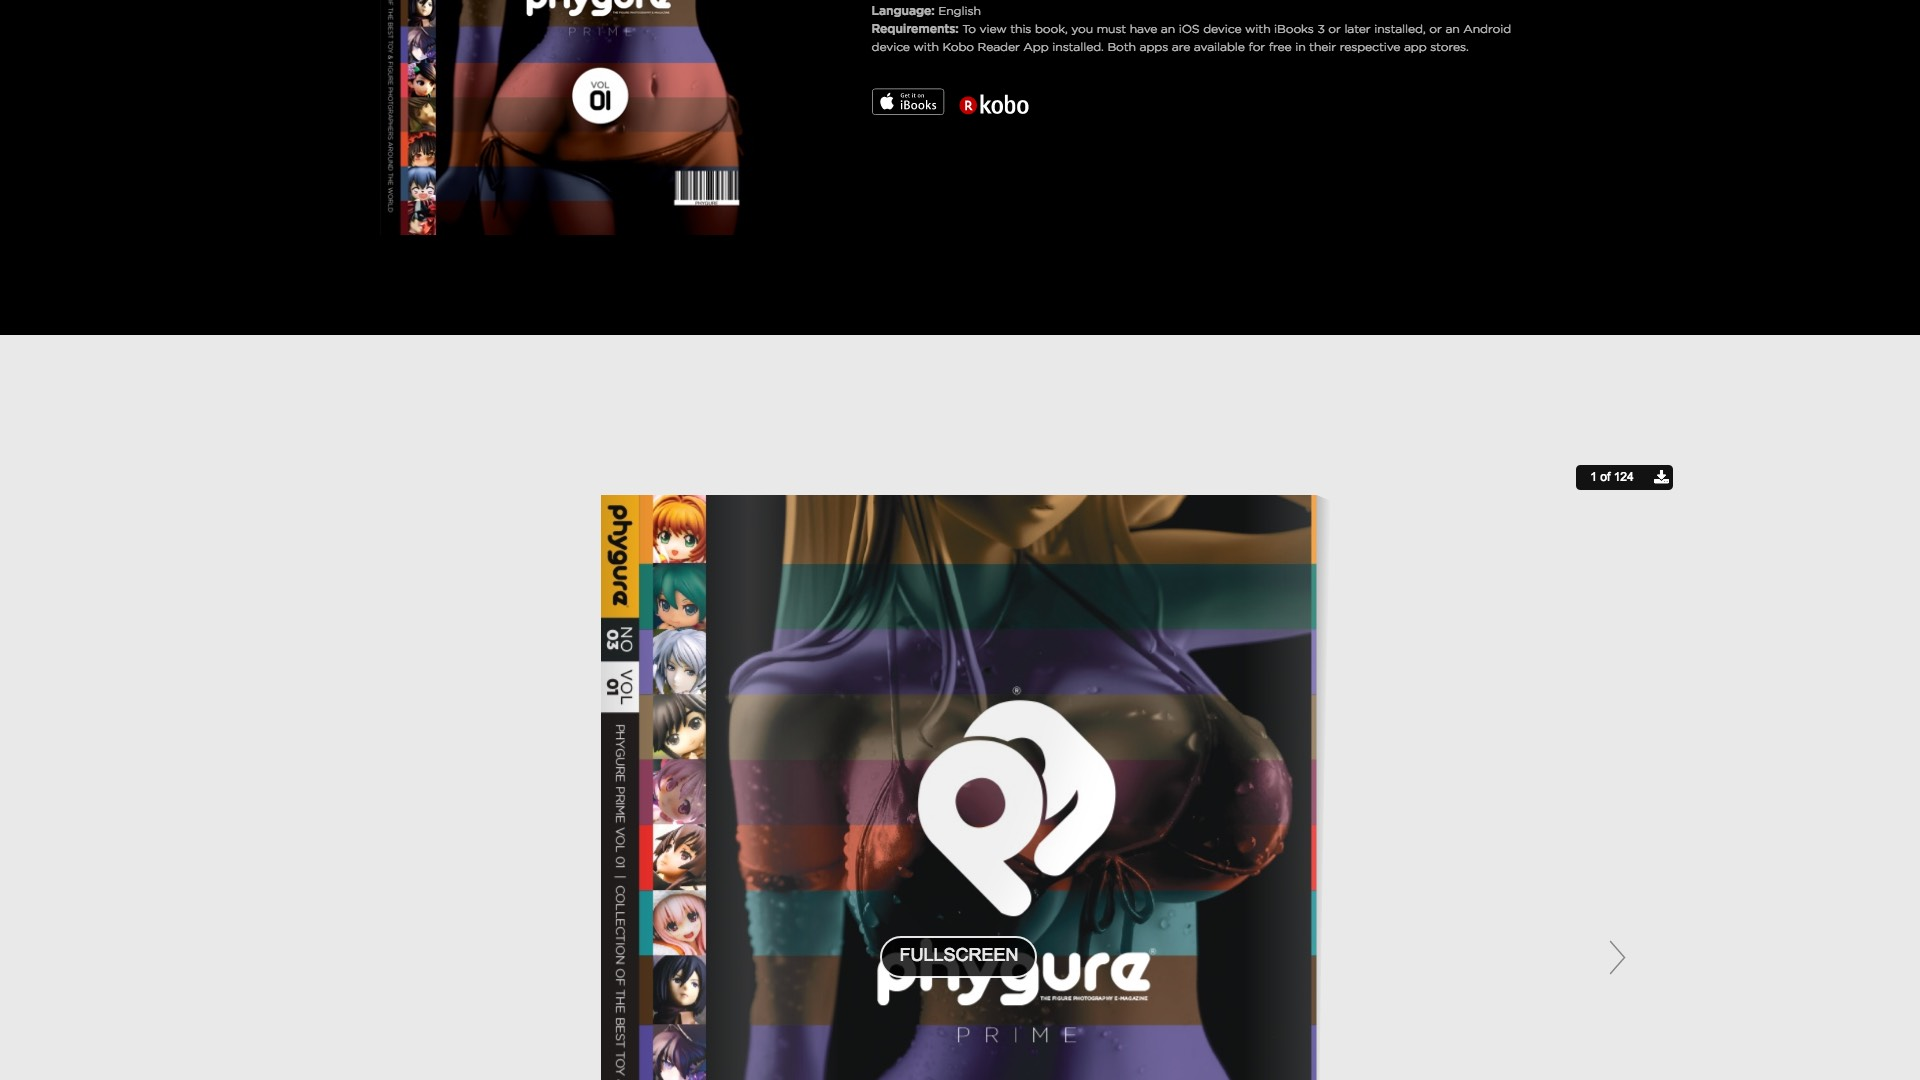 phygure-magazine-viewer-2